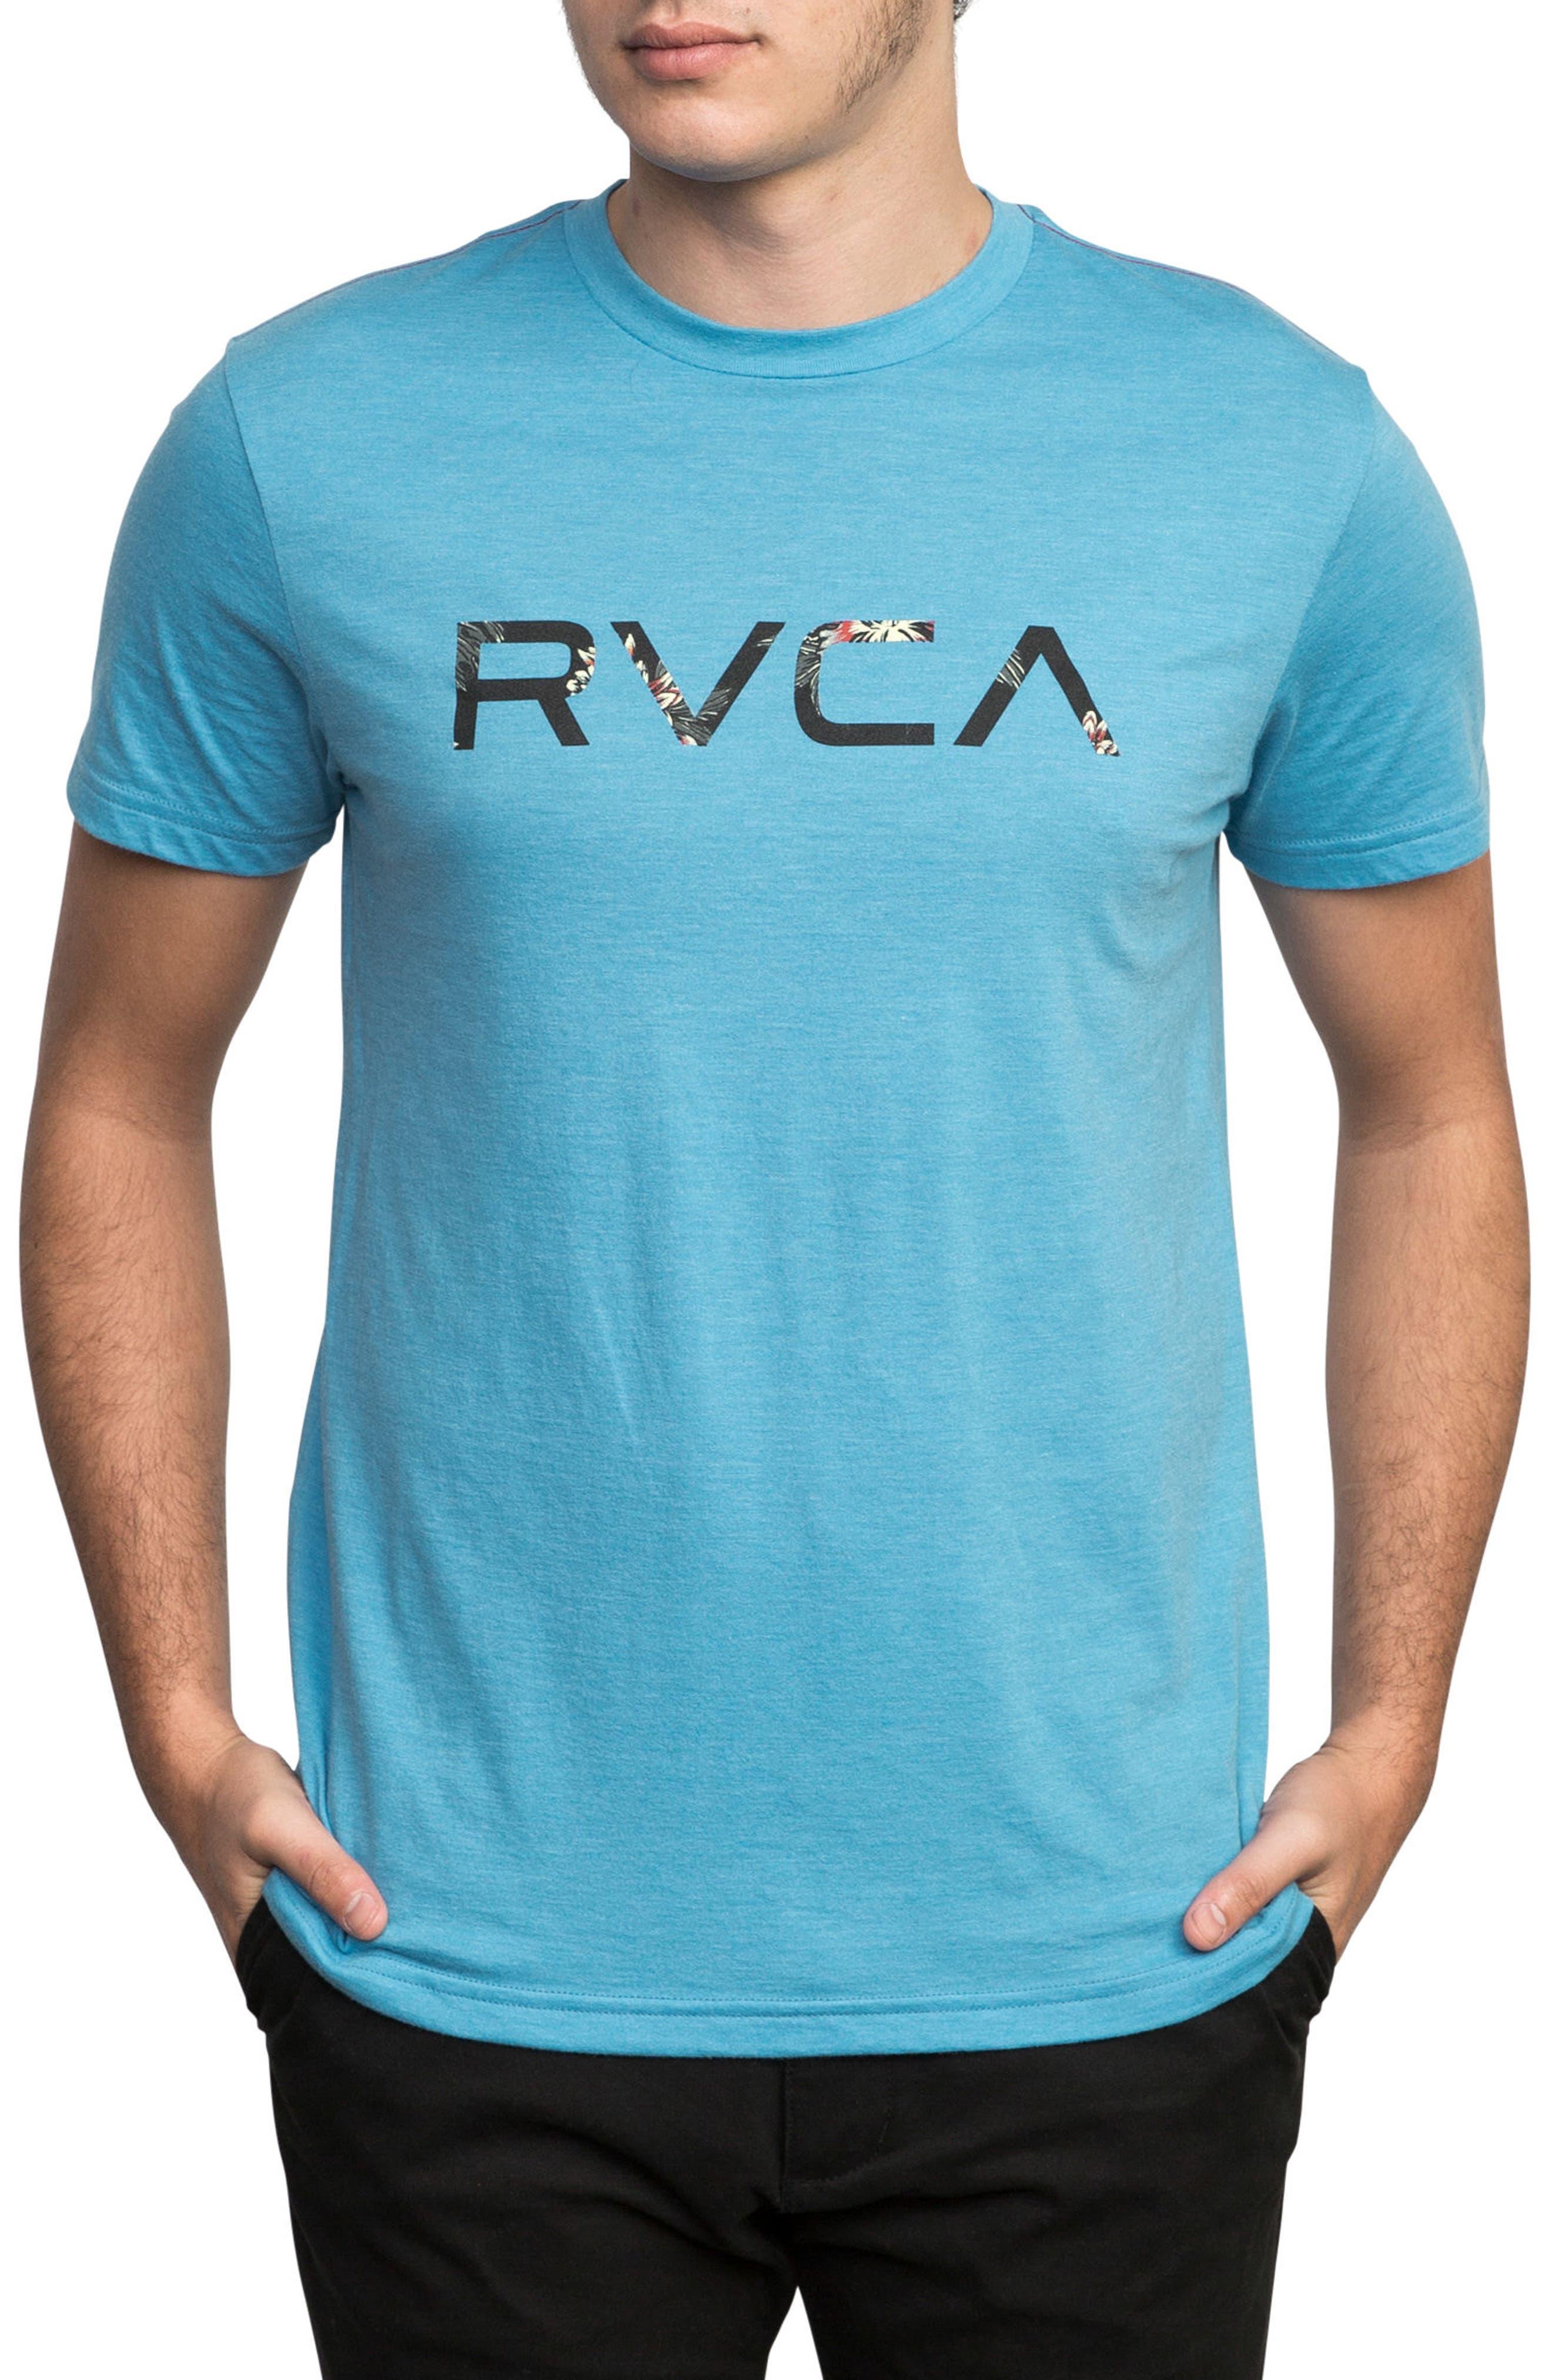 McFloral T-Shirt,                         Main,                         color, Lagoon